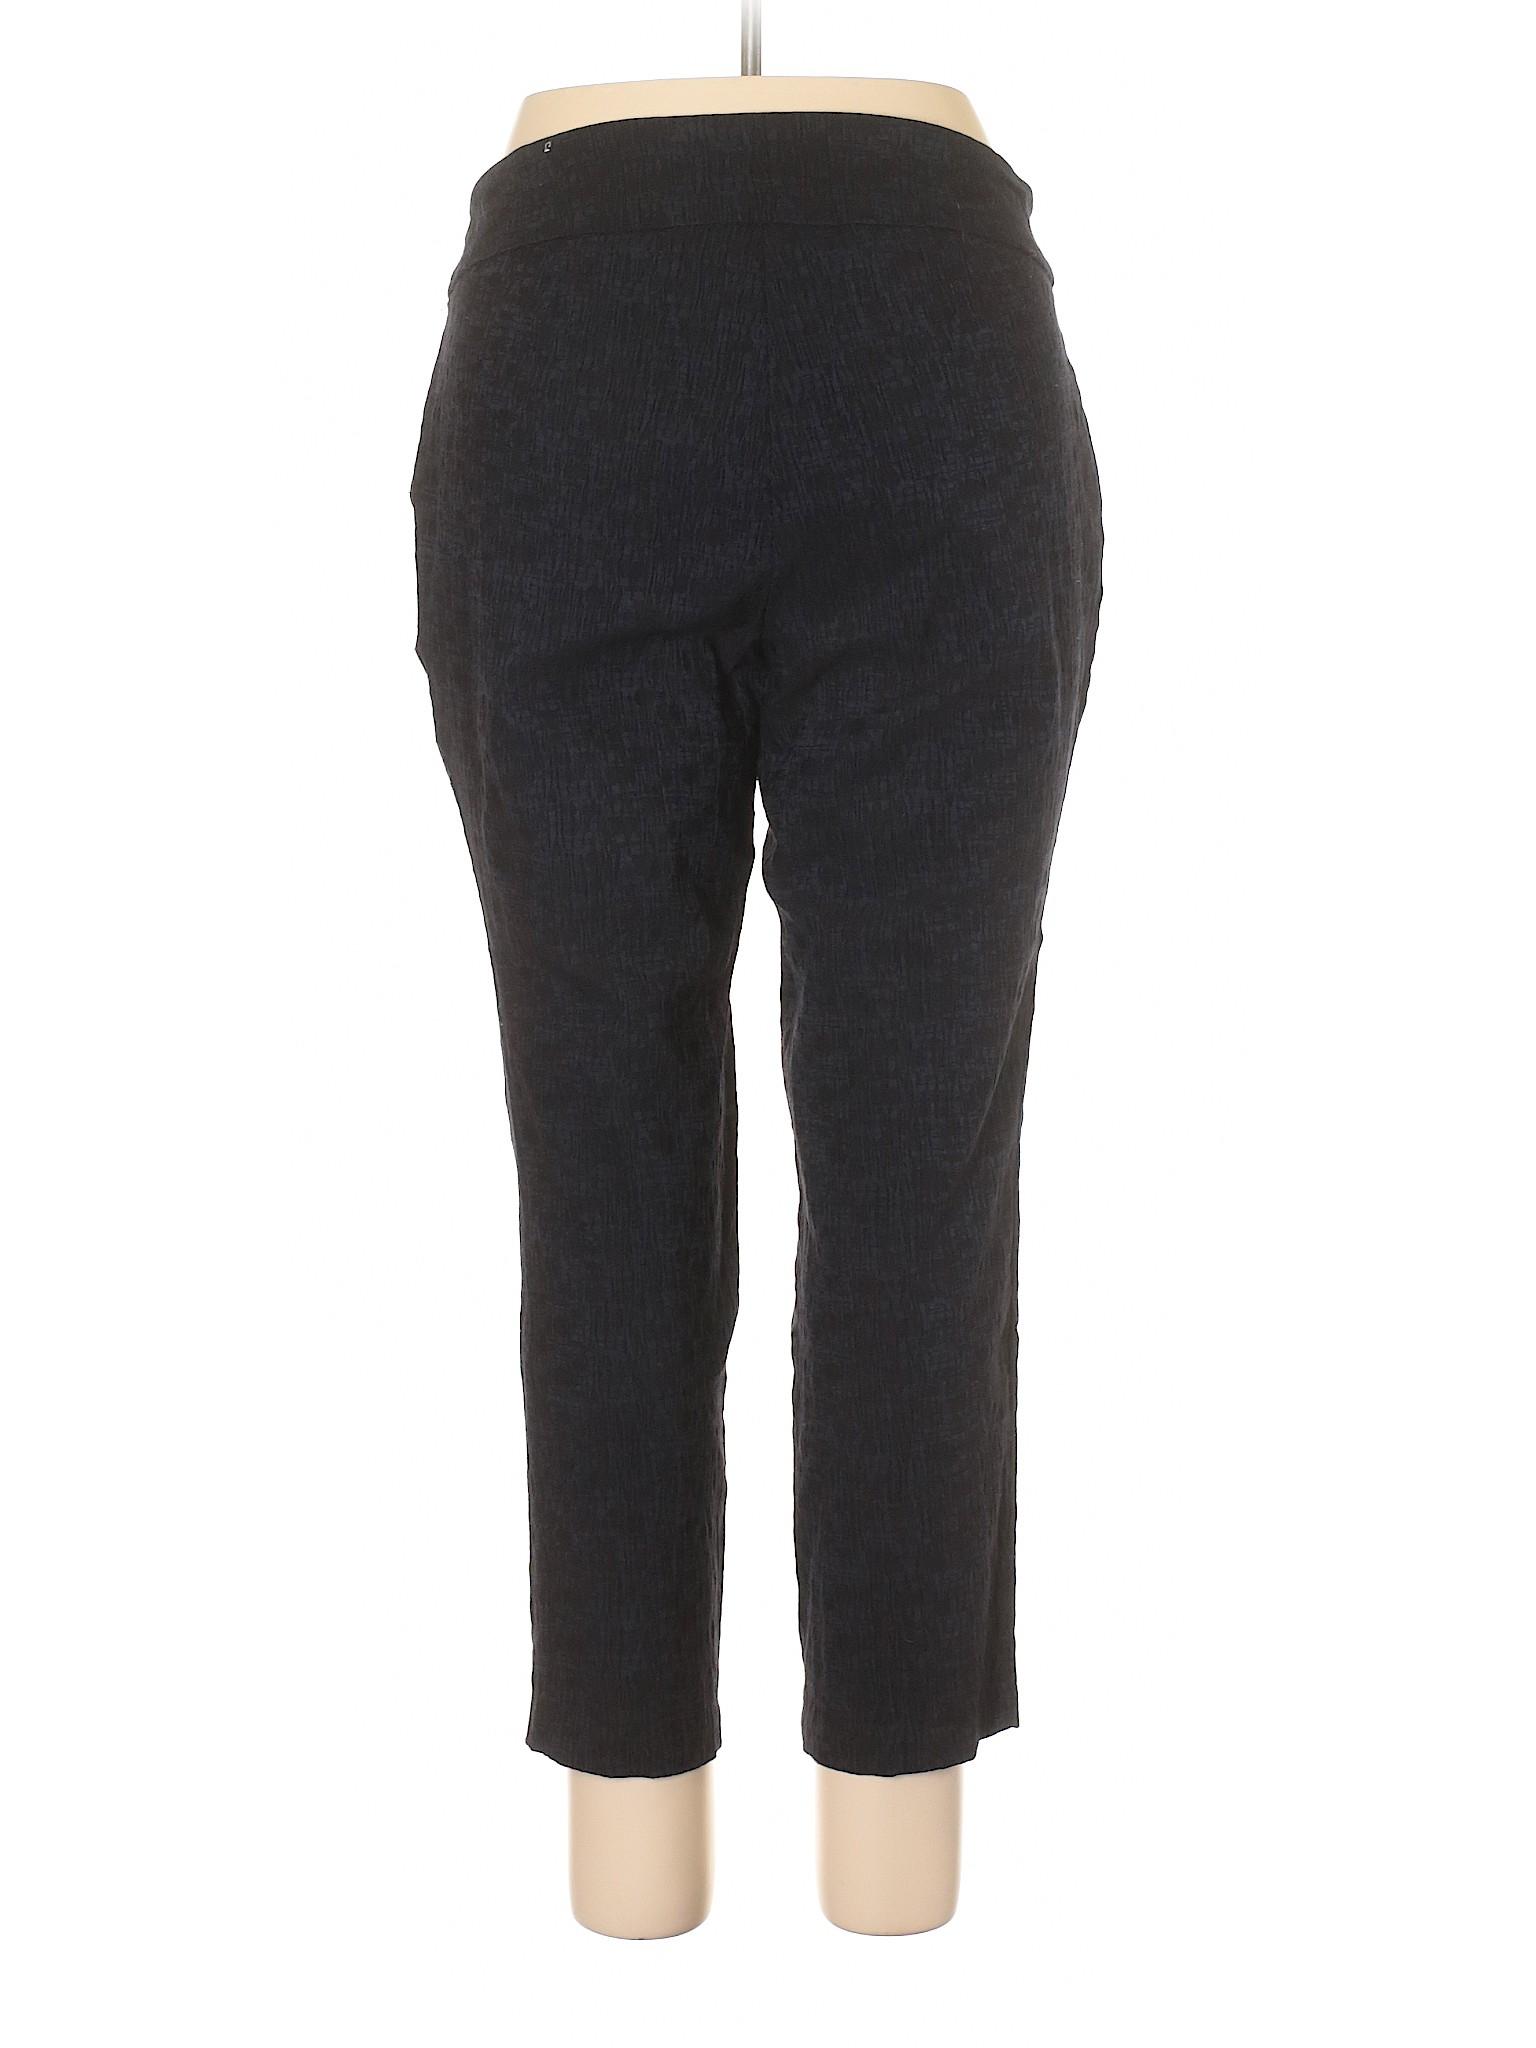 amp; Pants Juliana Jasmine Casual leisure Boutique wq4P8EWw